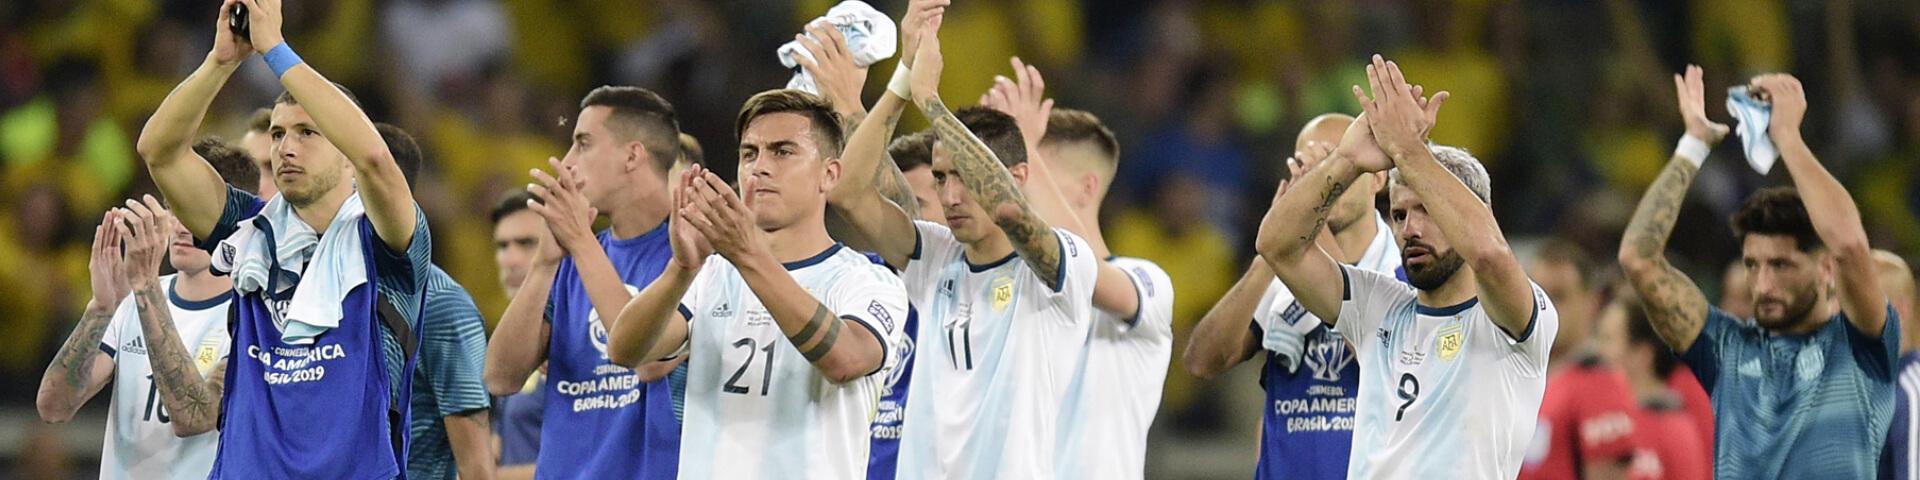 Букмекеры: Аргентина выиграет у Чили